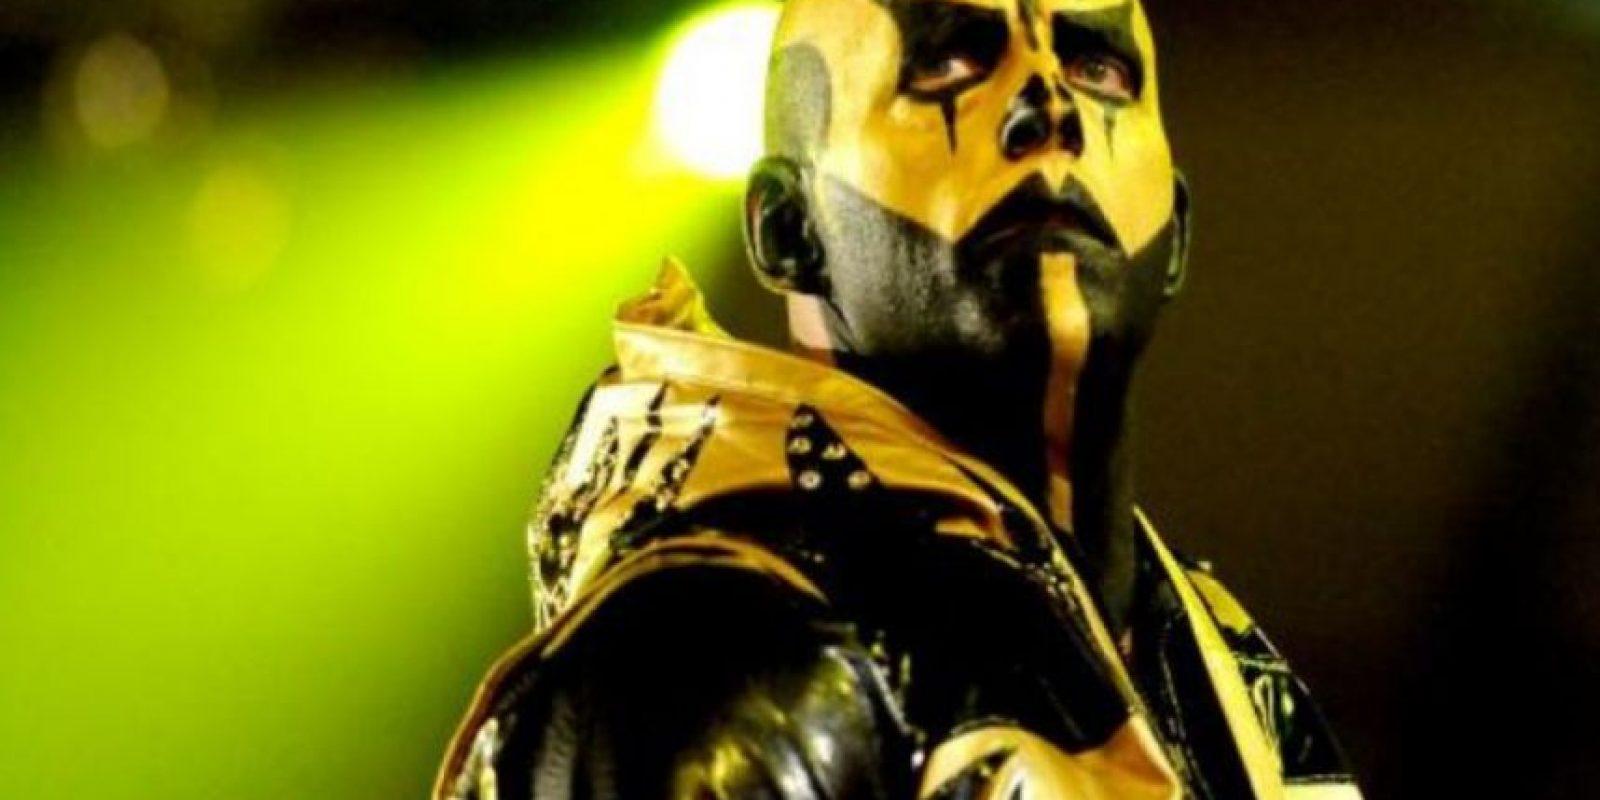 Así luce Goldust con maquillaje Foto:WWE